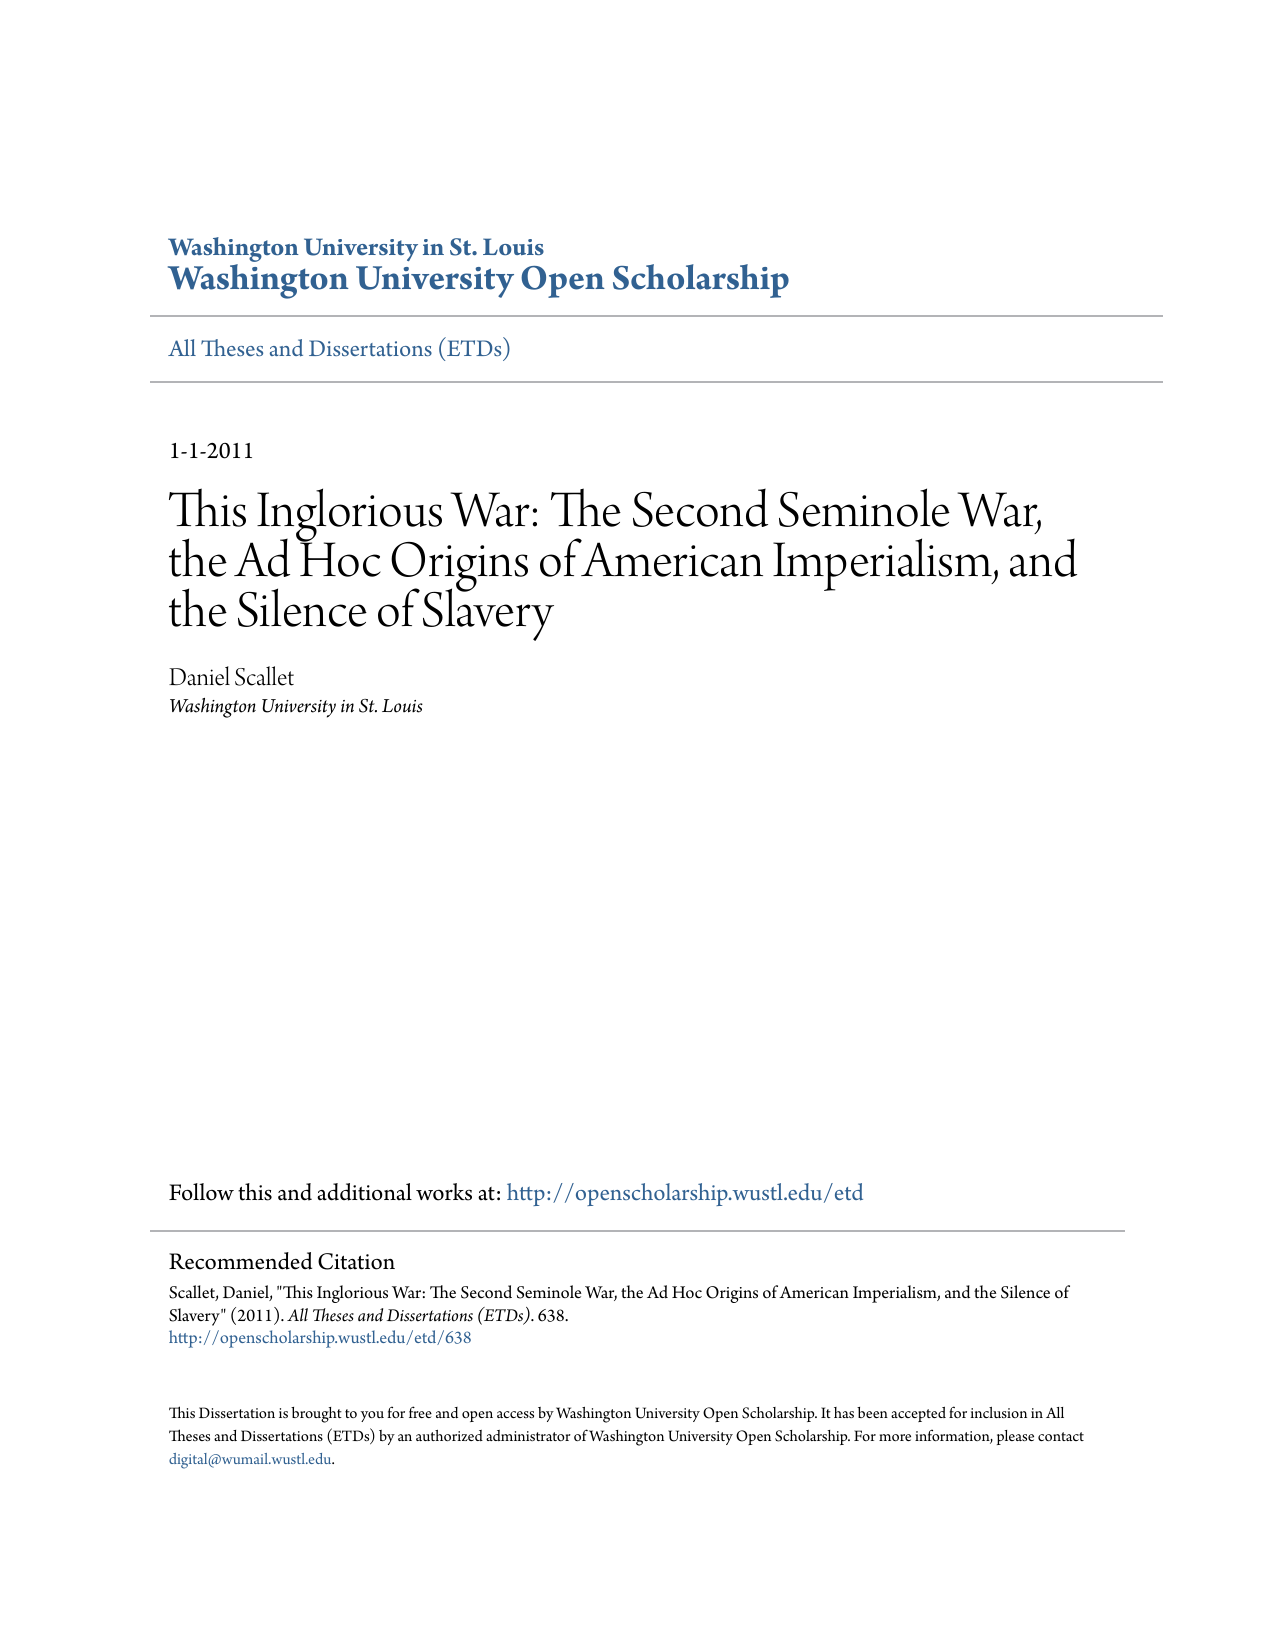 This Inglorious War - Washington University Open Scholarship 9e2bf6e93